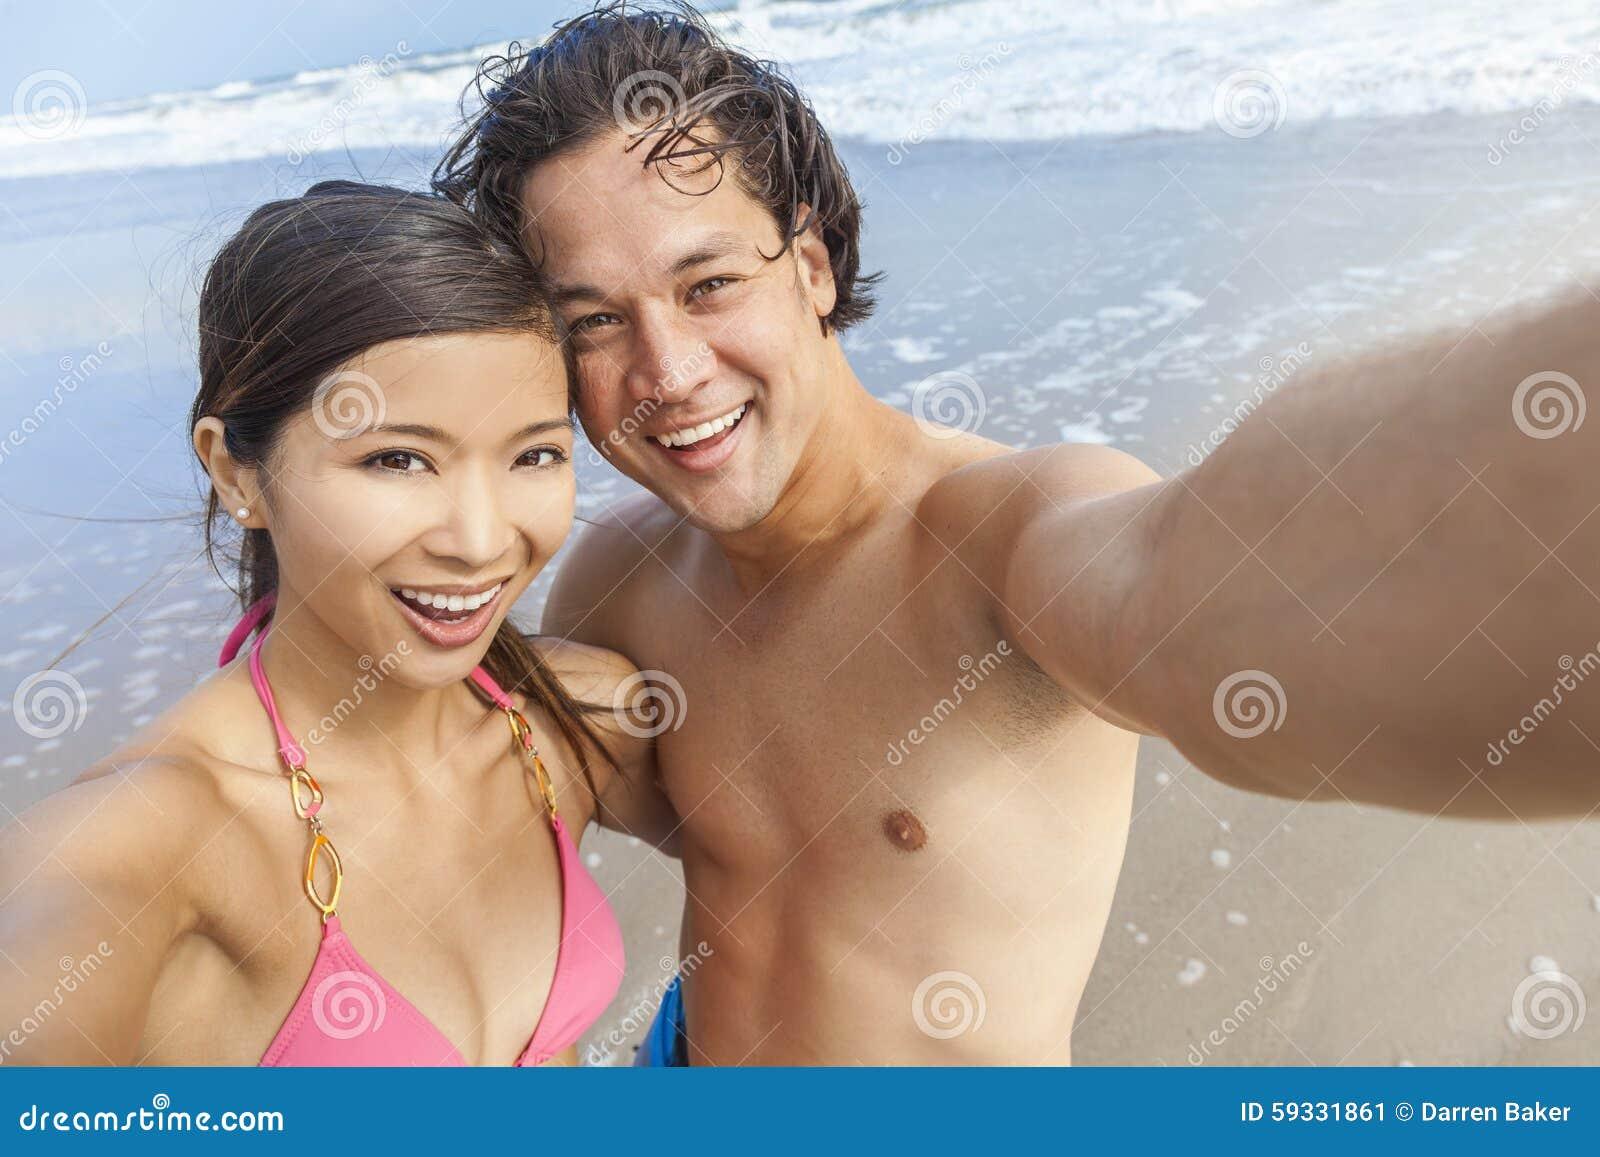 Asiatische Sexparty Am Strand